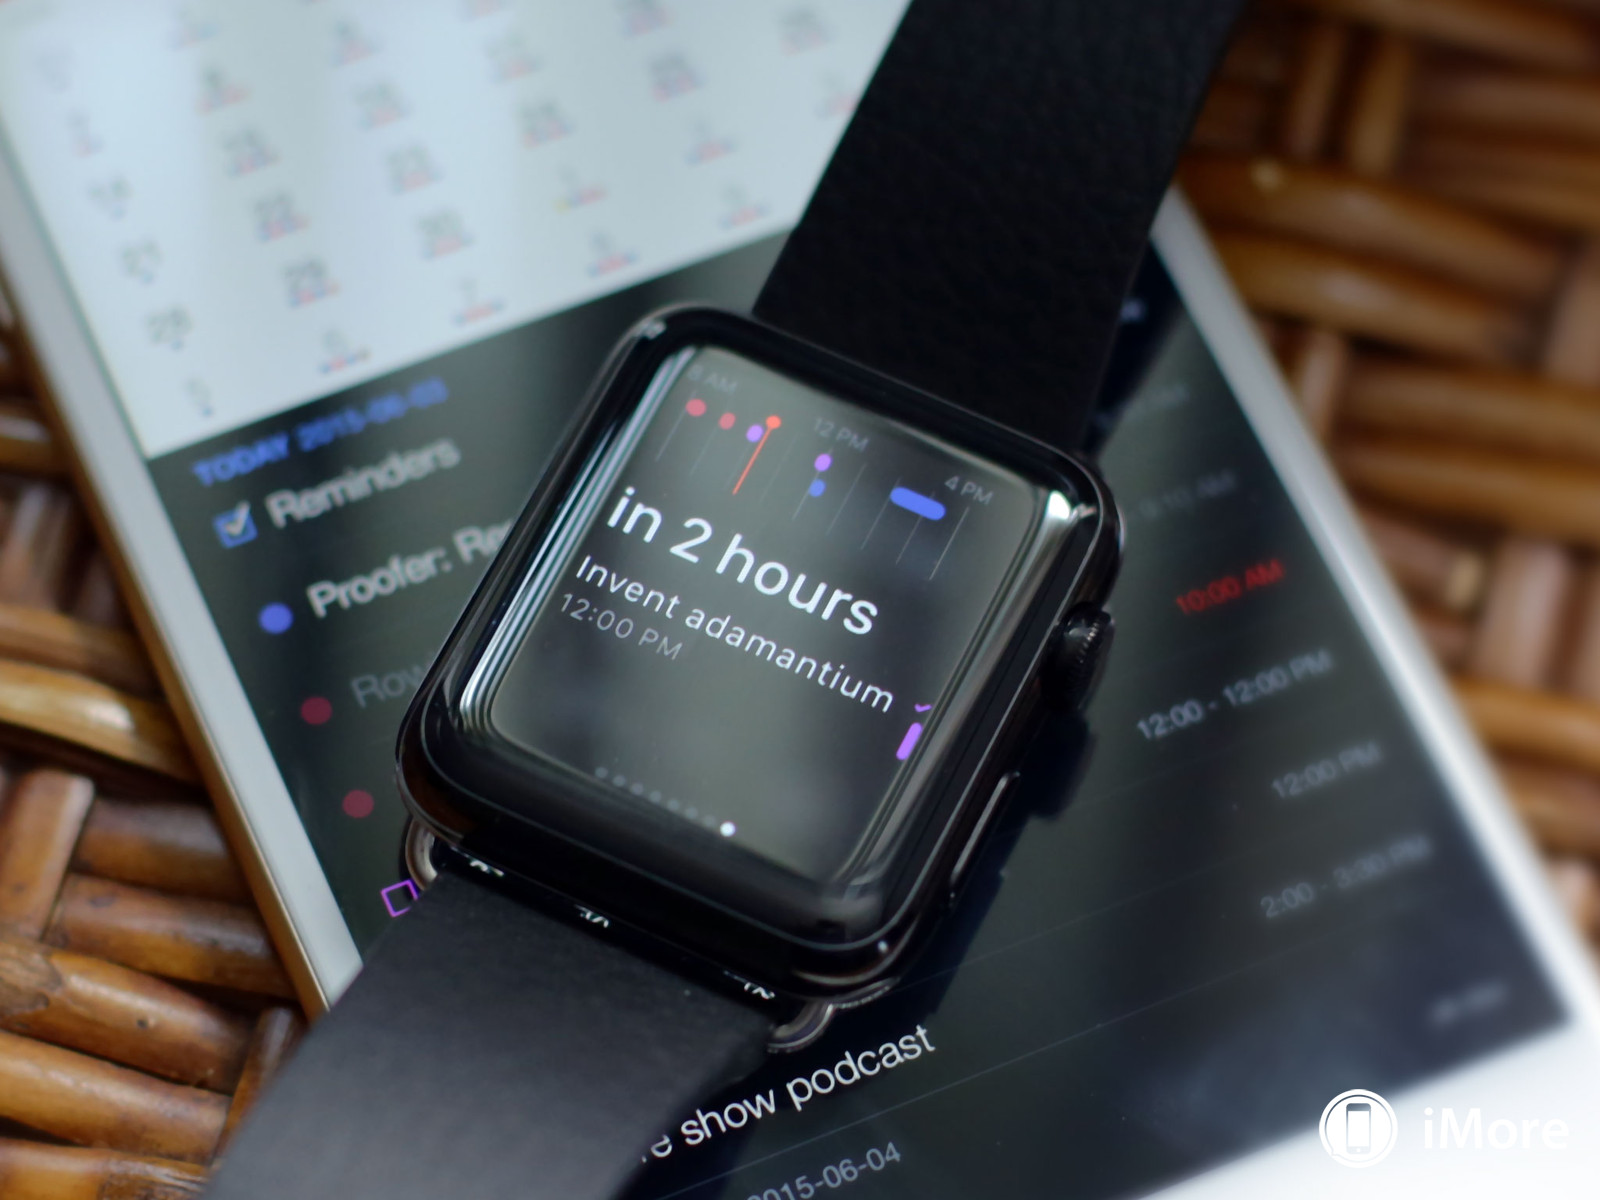 Apple Watch meeting reminder